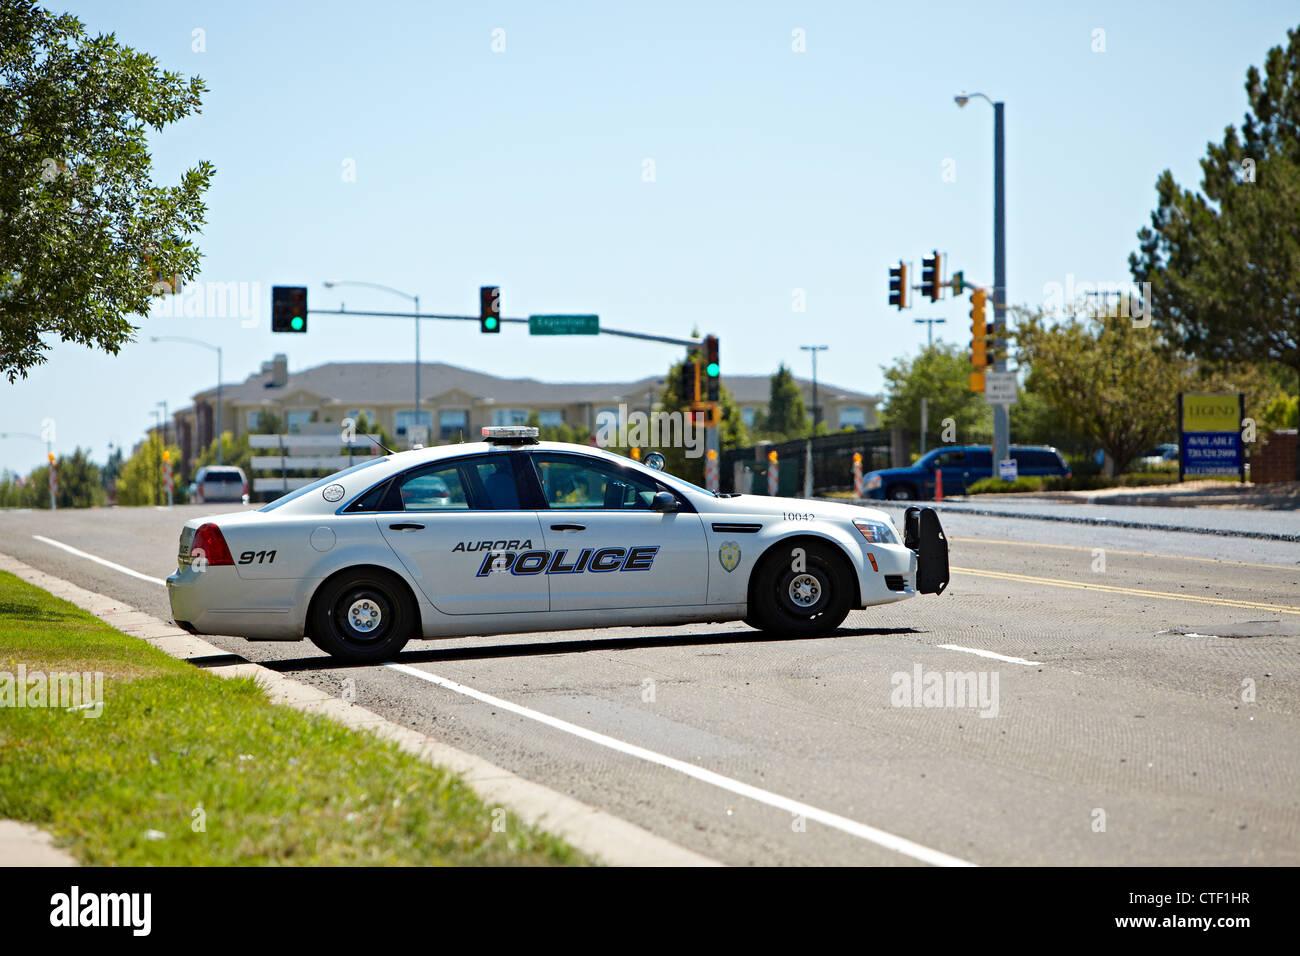 Aurora Police Stock Photos & Aurora Police Stock Images - Alamy